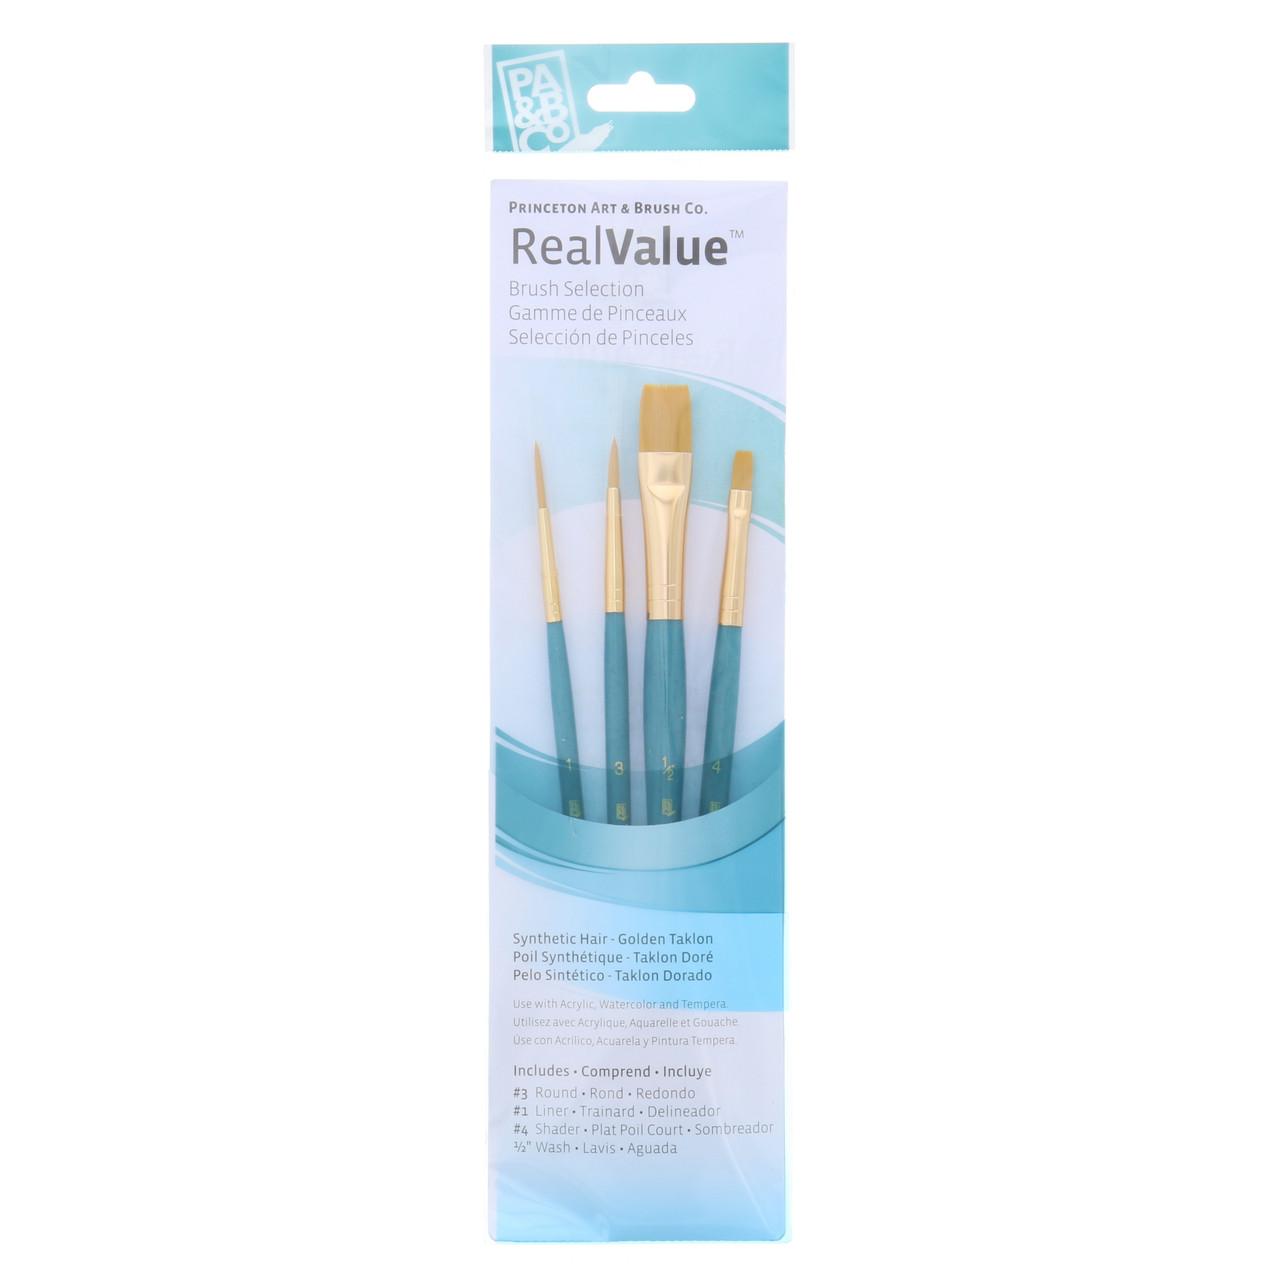 Synthetic Golden Taklon 4-Brush Set Round 3, Liner 1, Shader 4, Wash 1/2